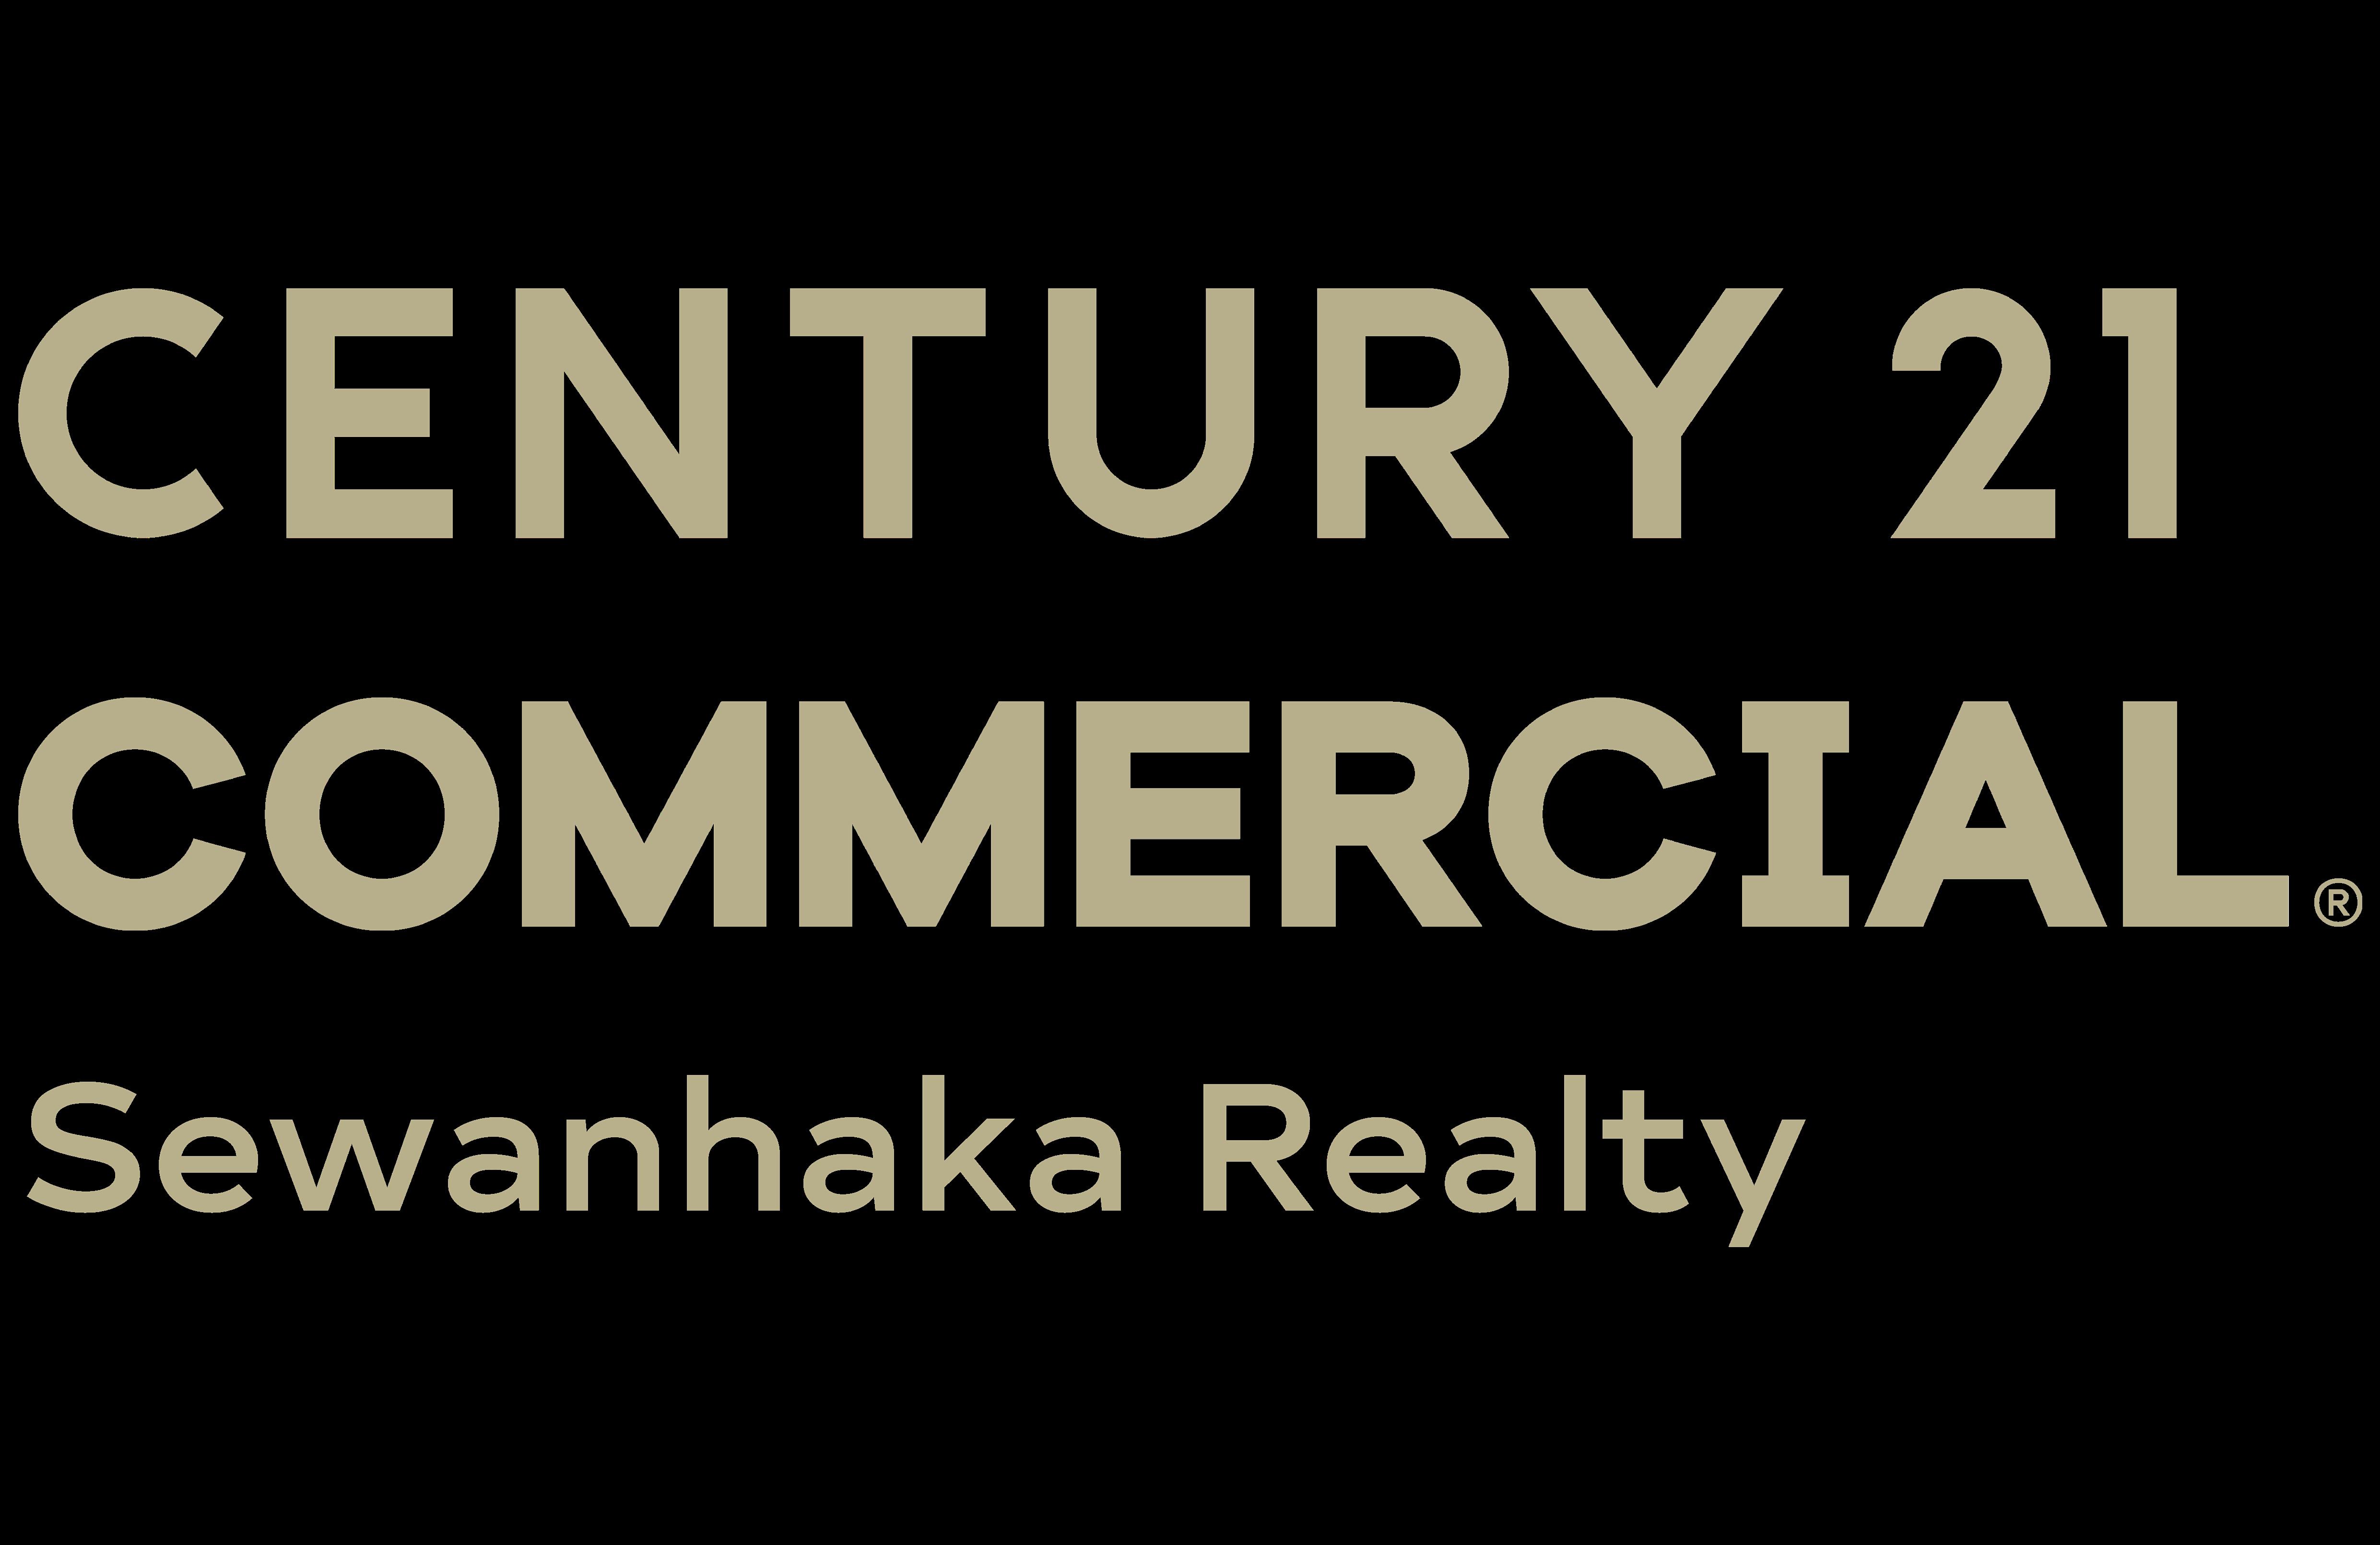 Patrick Lynch of CENTURY 21 Sewanhaka Realty logo